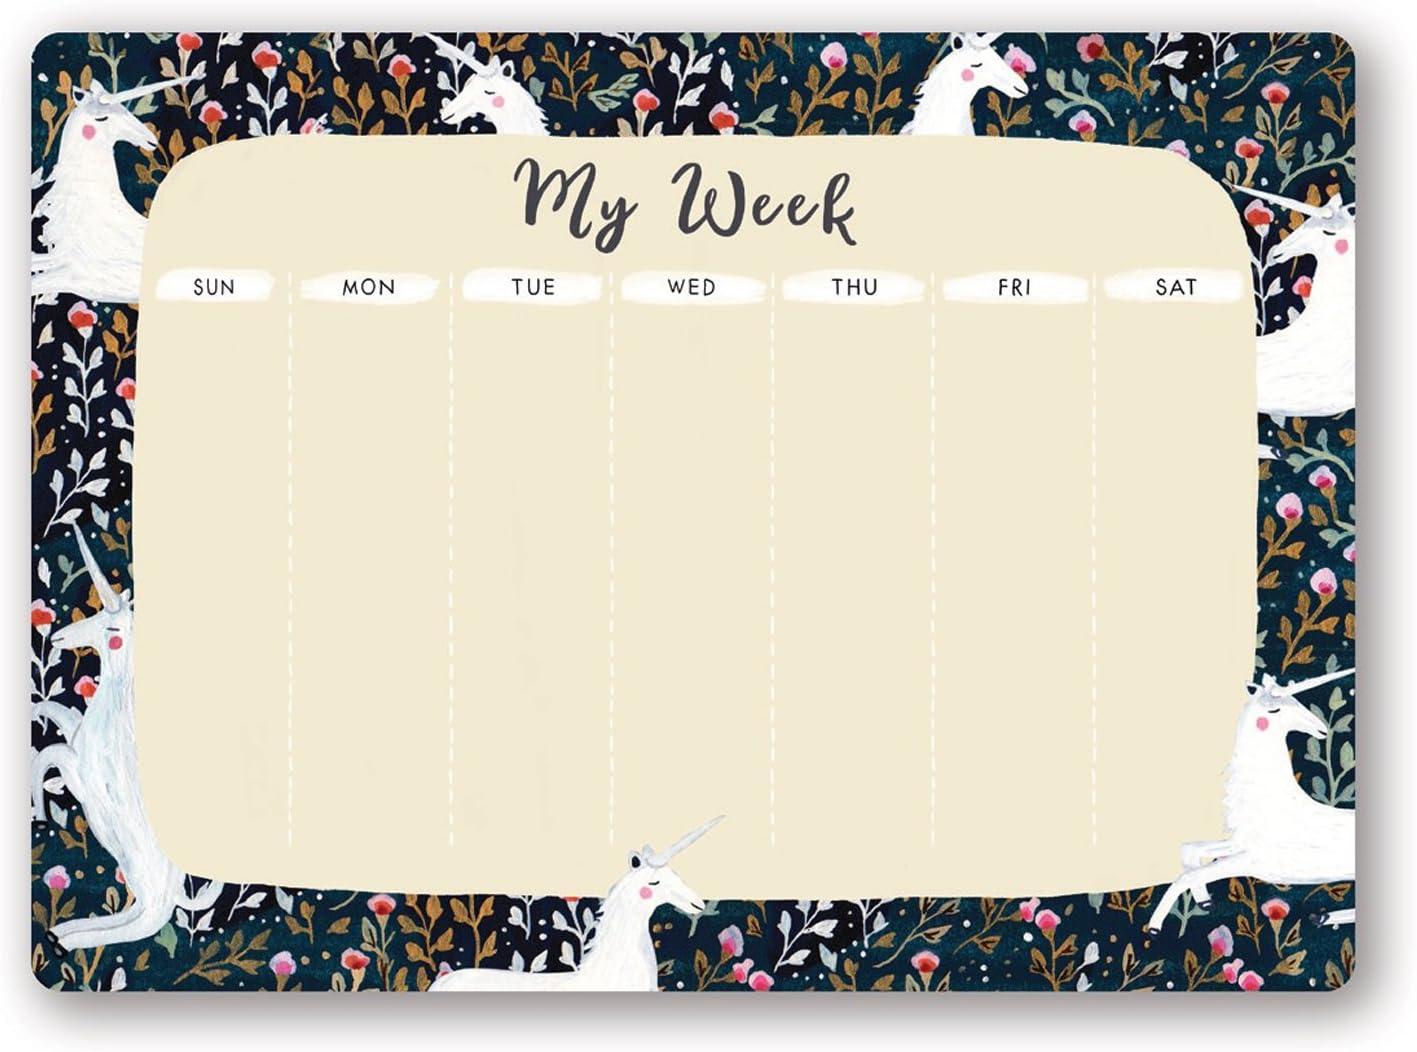 Studio Oh! Undated Weekly Desk Pad Available in 4 Designs, Sonia Cavallini Magical Unicorns